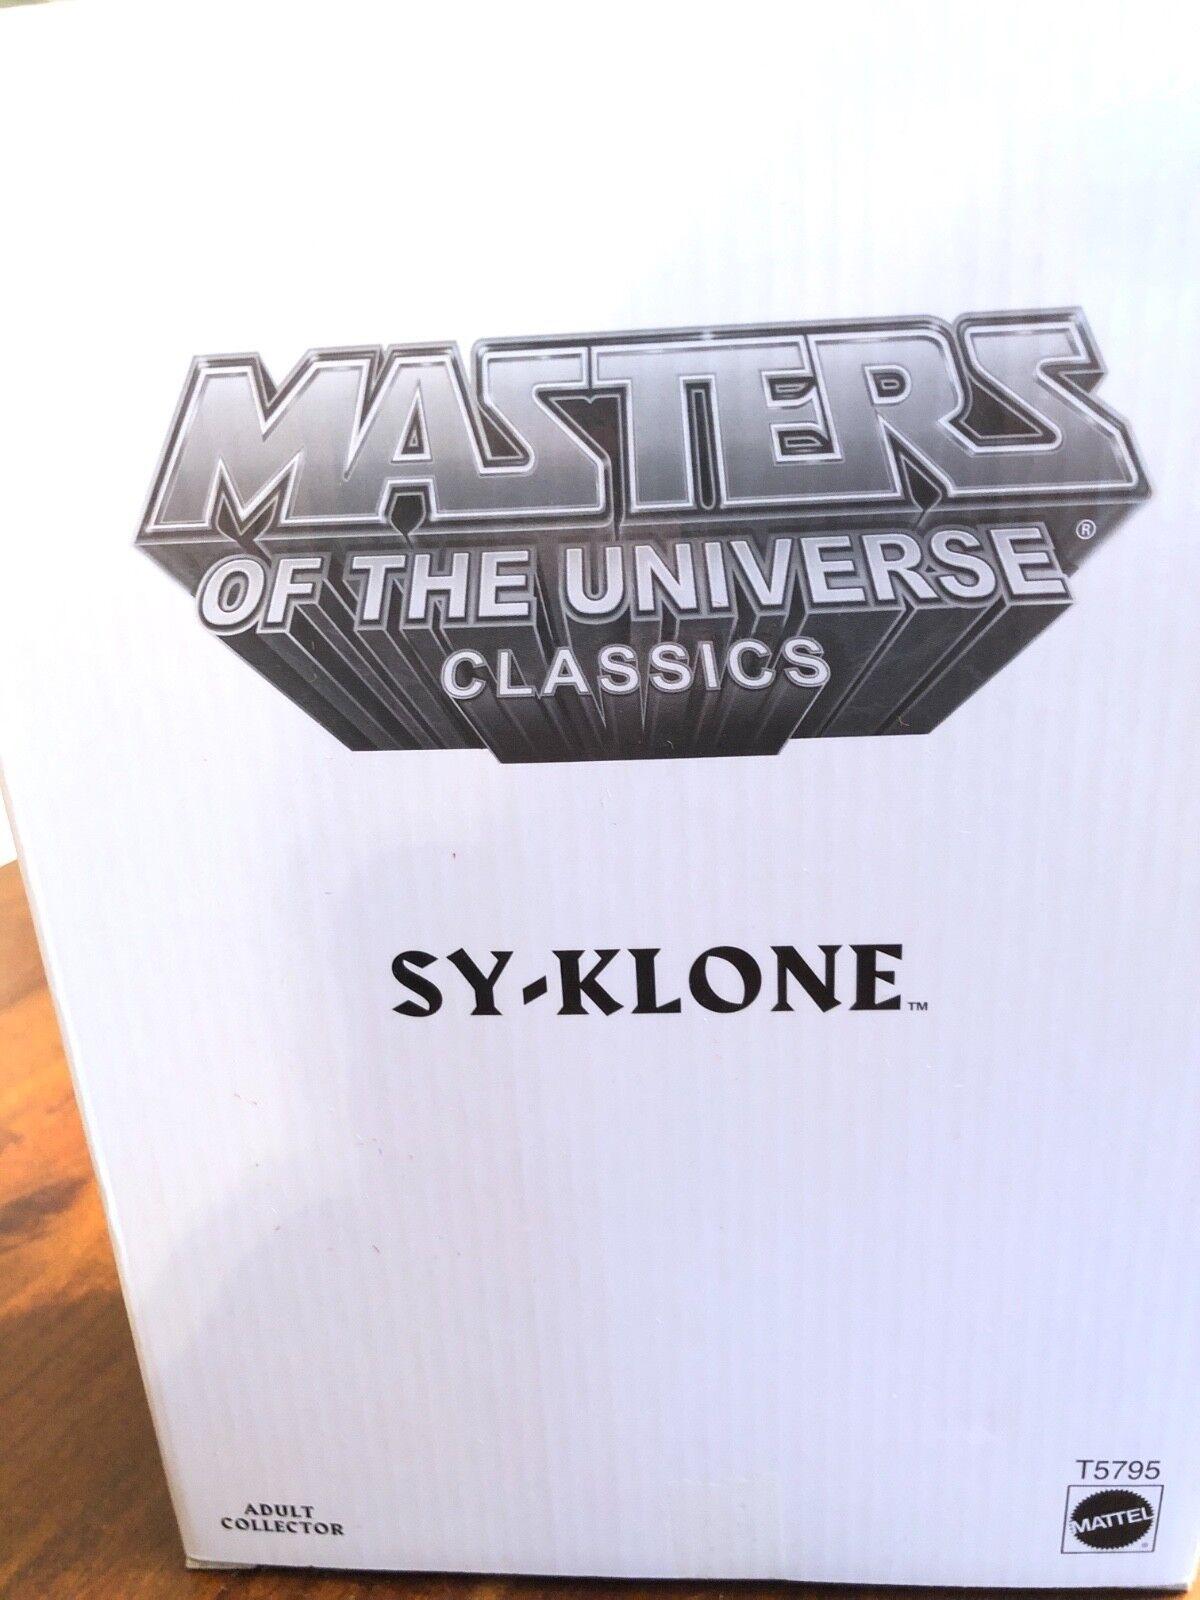 Meister des universums motu sy-klone matty sammler mattel versiegelt mailer